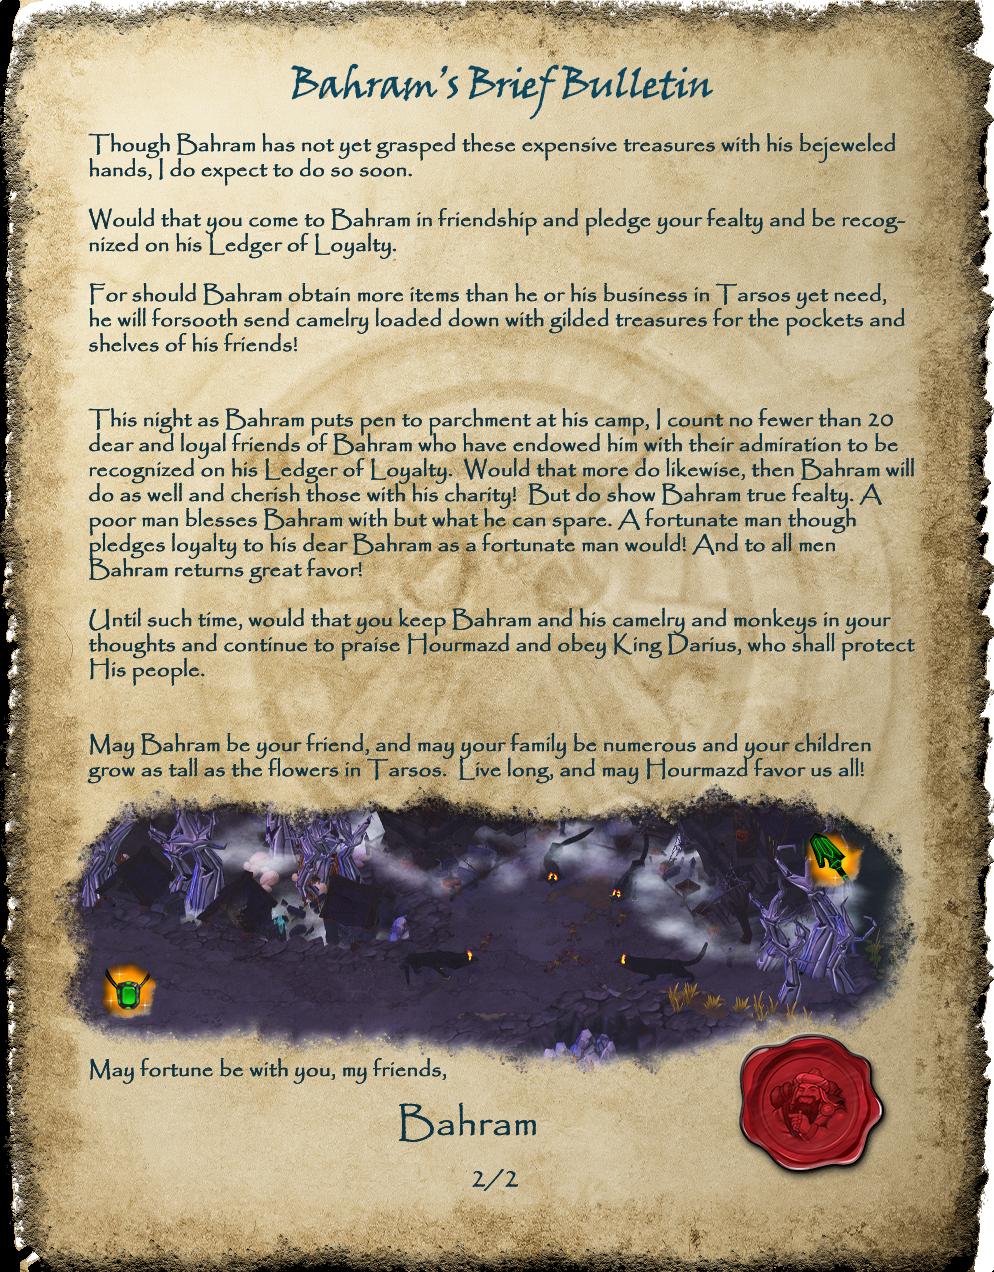 BahramsBriefBulletin-Page2.png